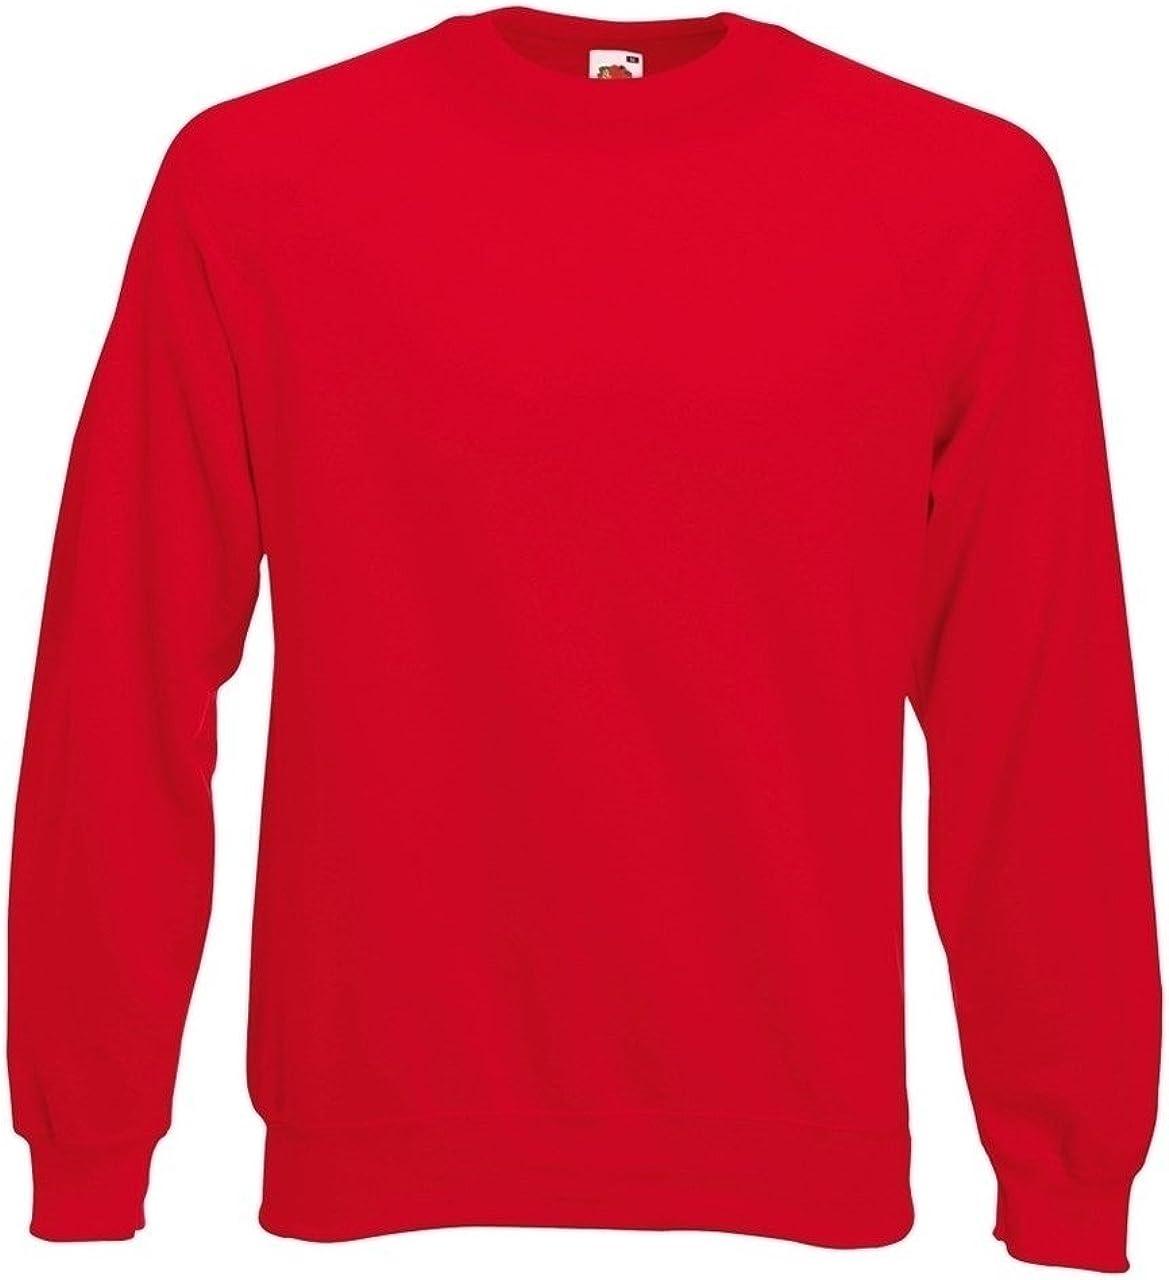 Black Royal Red Burgundy Grey Navy Blue Fruit-Of-The-Loom Mens//Ladies Screen Star Plain Crew Neck Brushed Fleece Lined Classic Sweatshirt